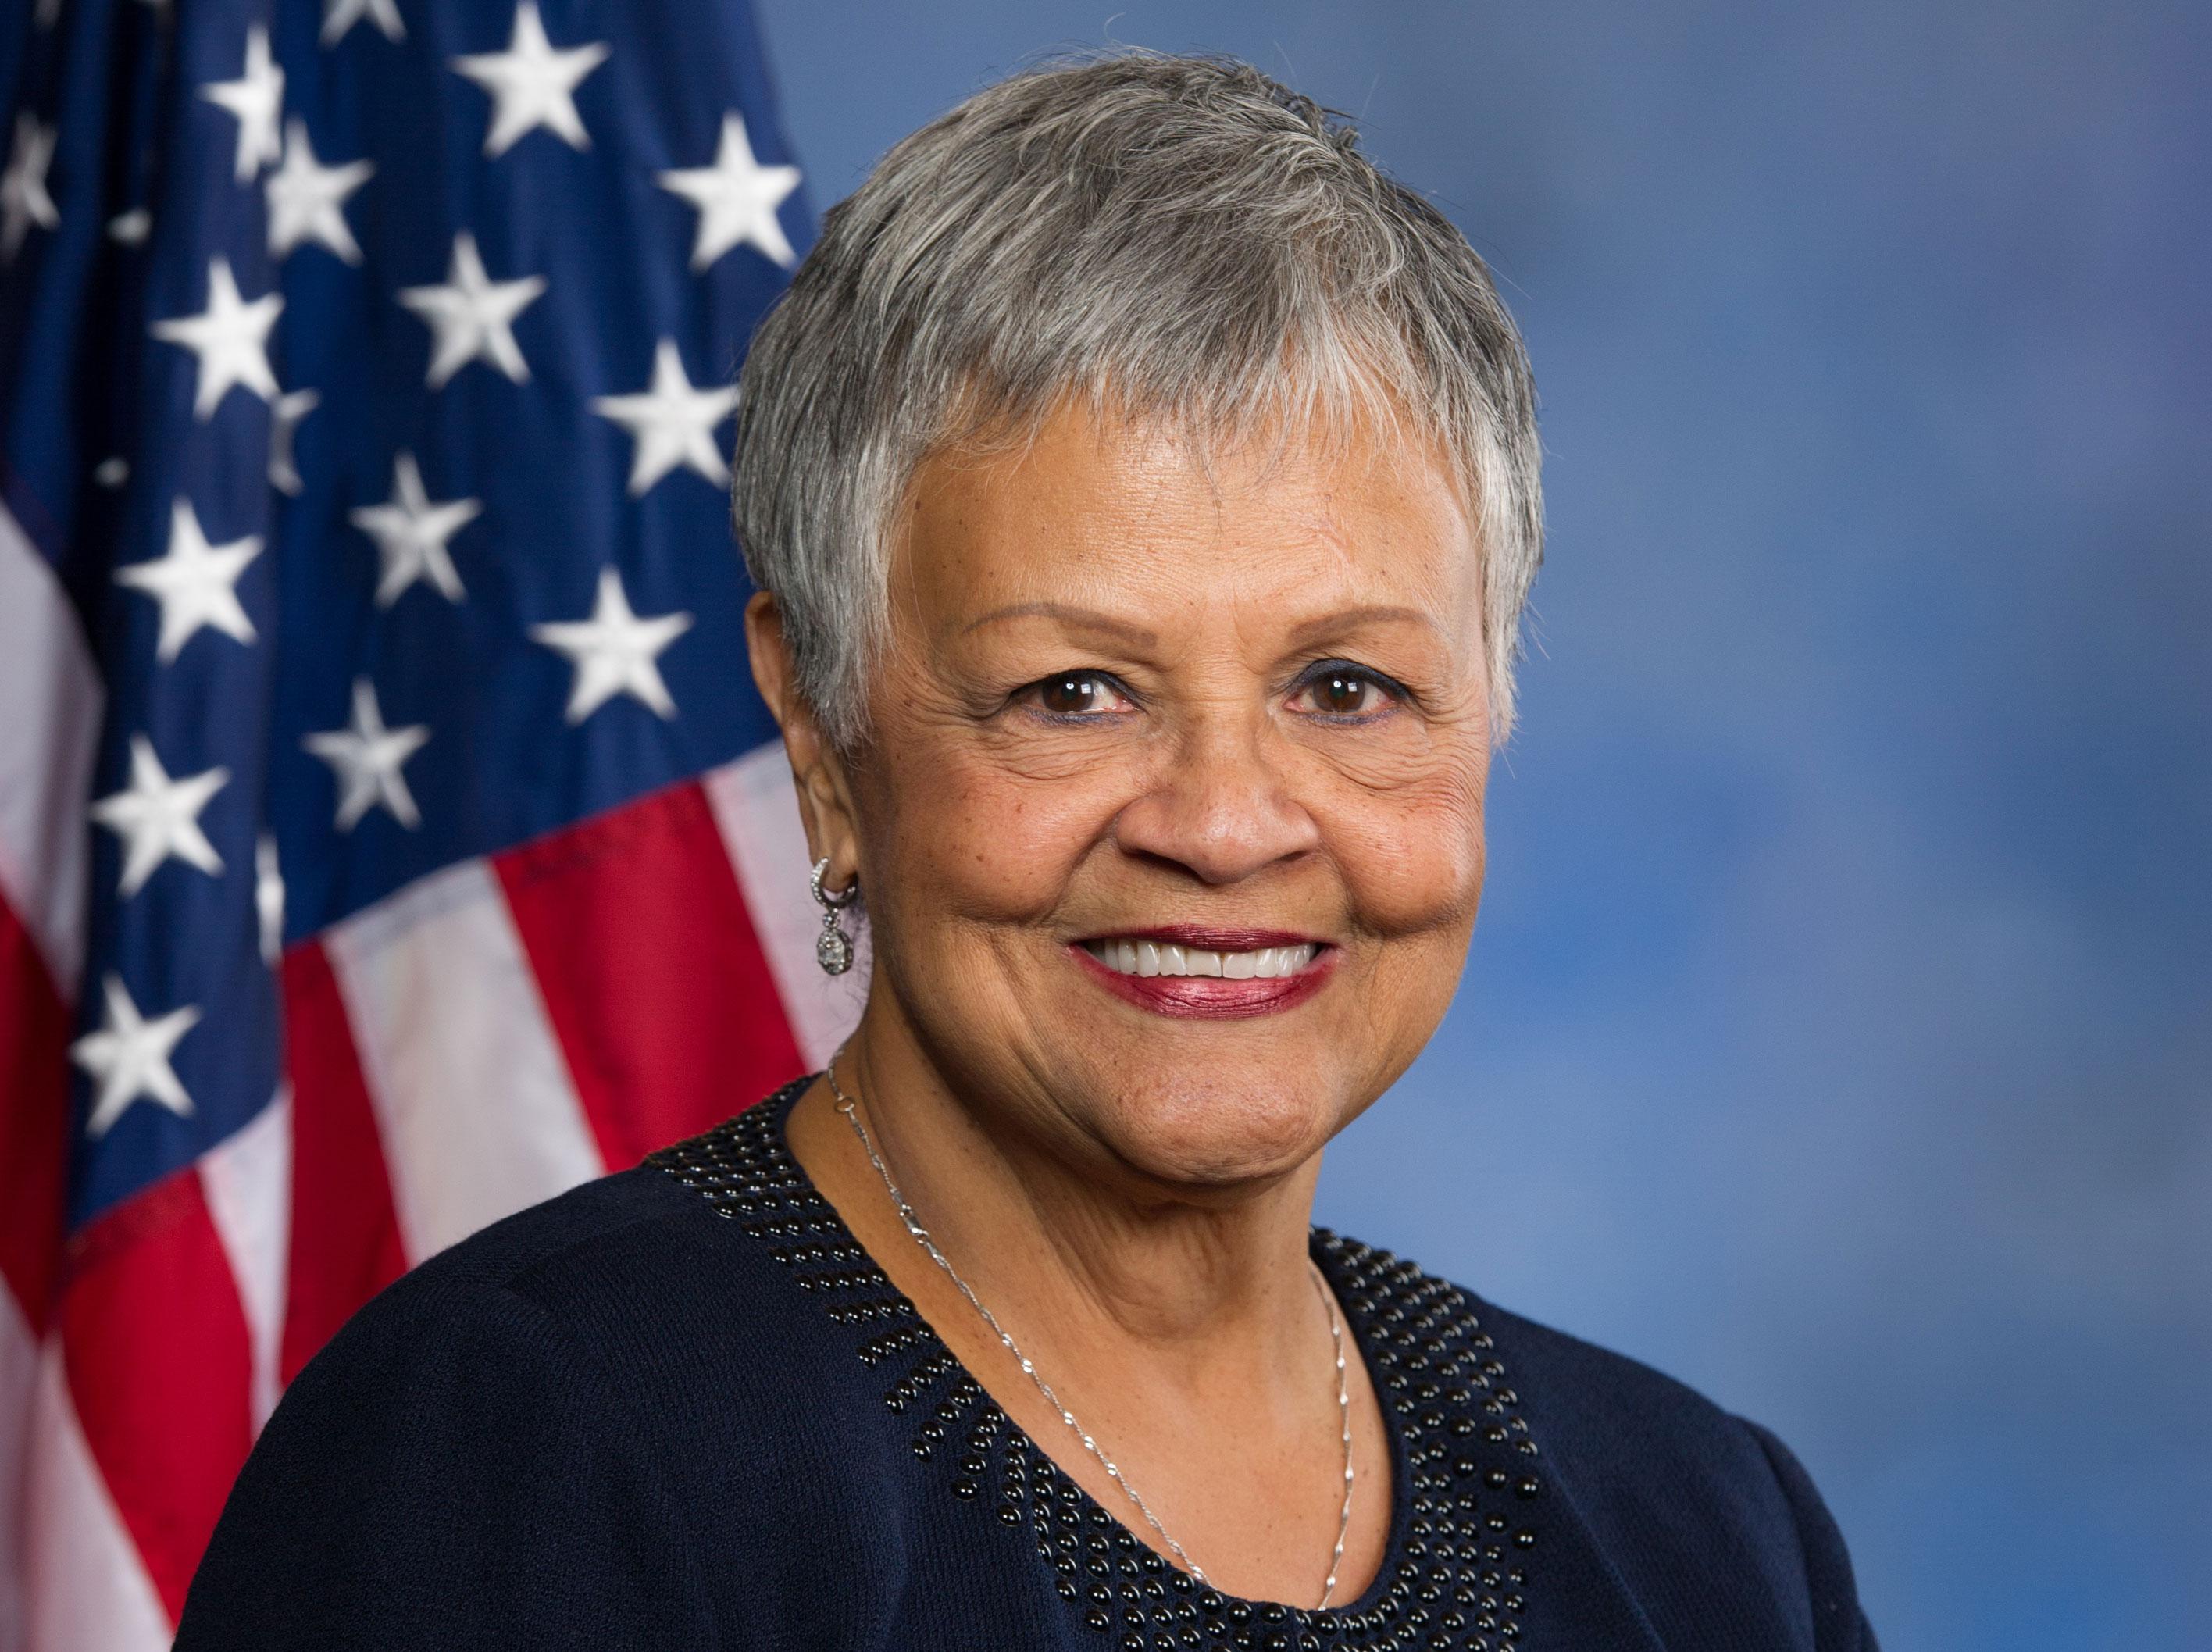 Rep. Bonnie Watson Coleman is seen in an undated handout photograph. U.S. House of Representatives/Handout via REUTERS